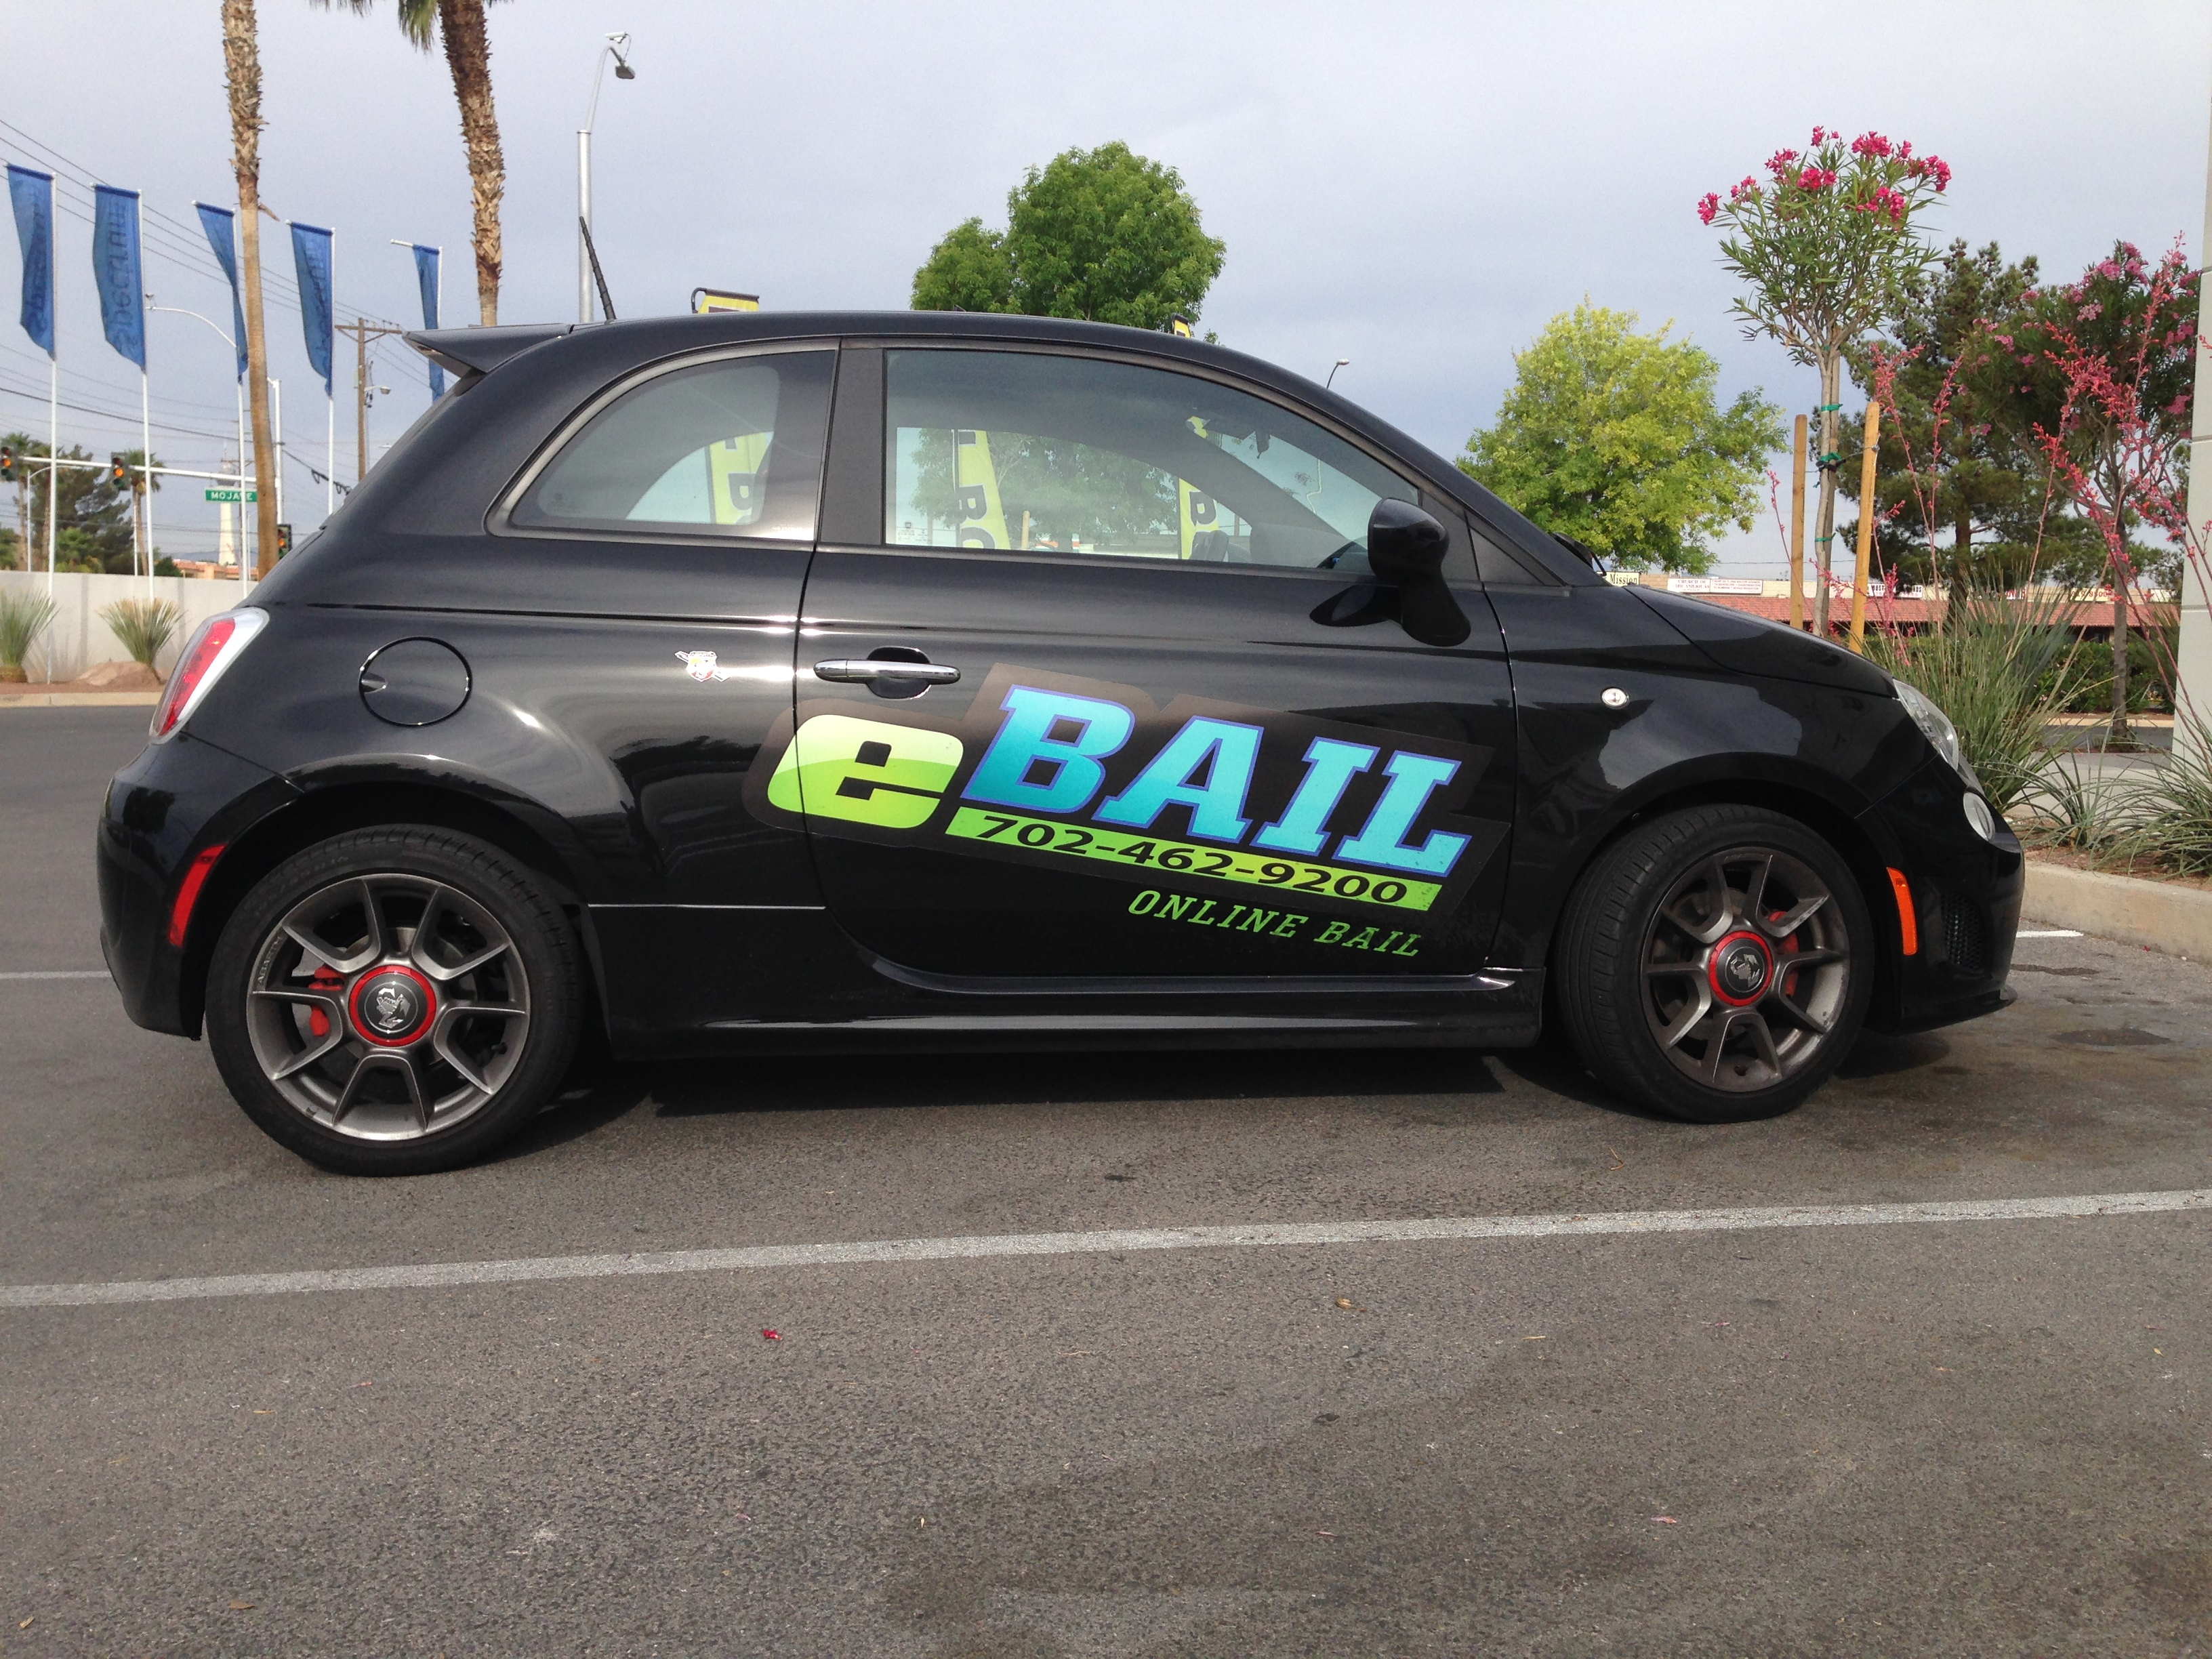 Bail Bonds in Las Vegas